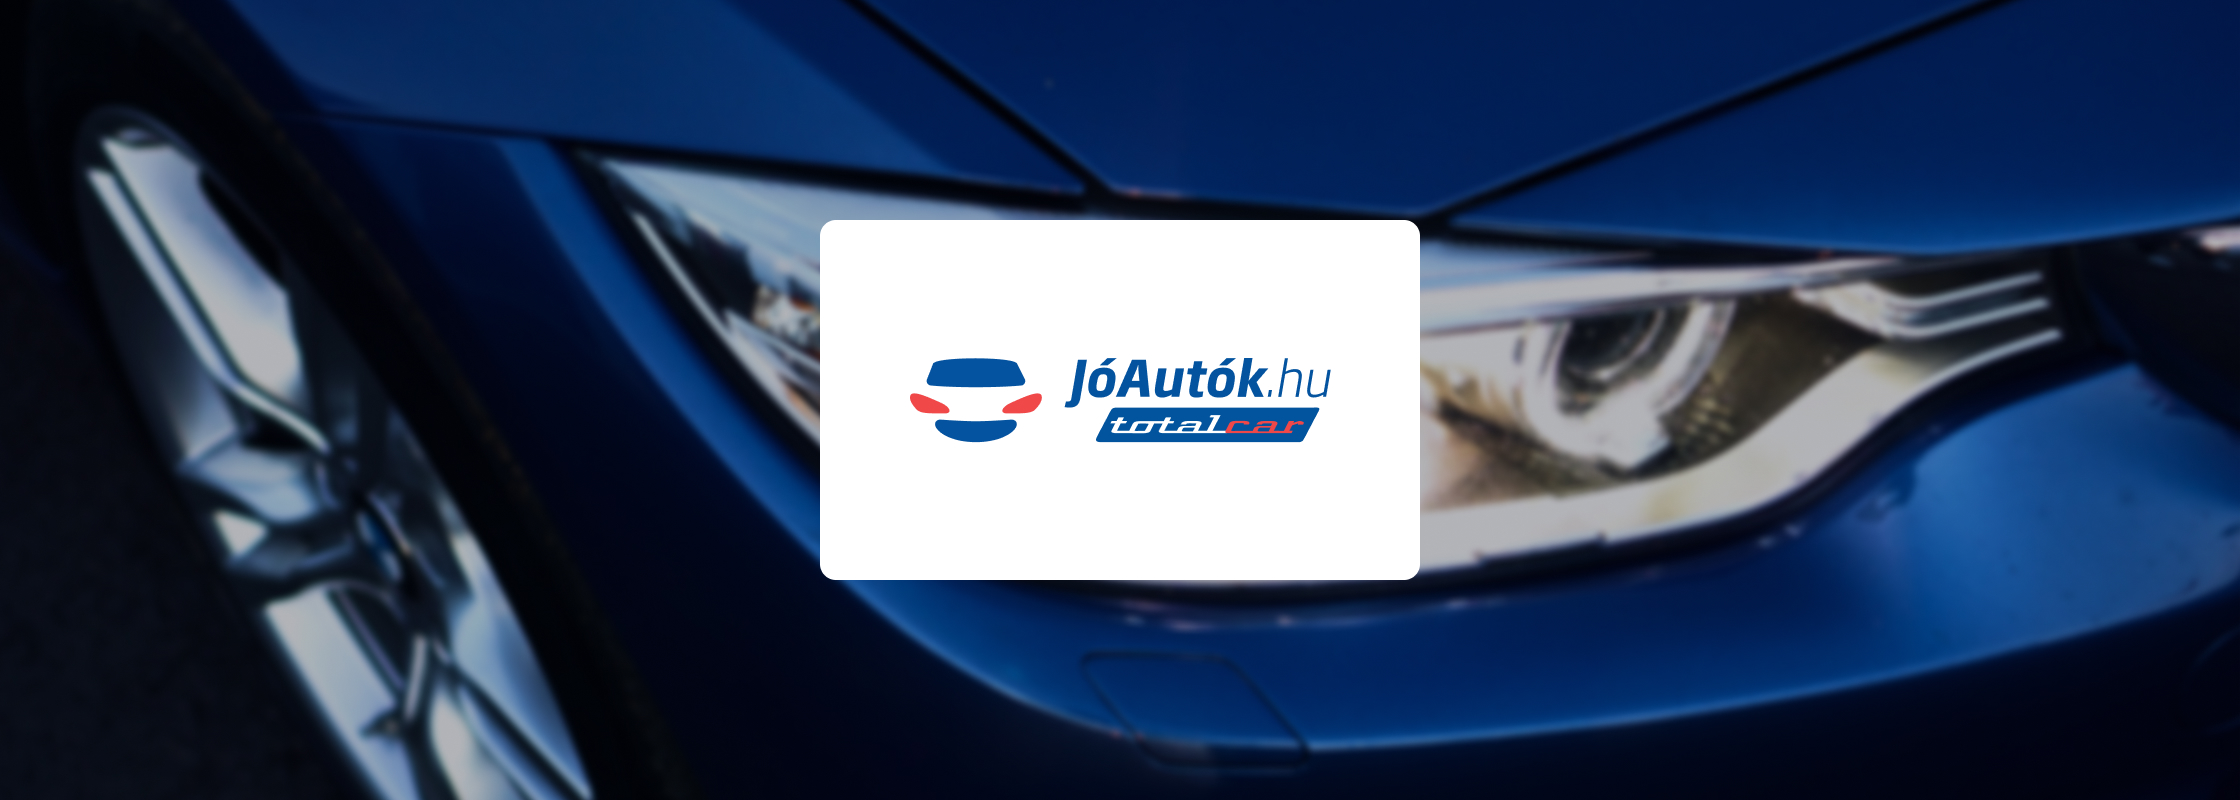 Virgo esettanulmányok - Jóautók.hu projekt